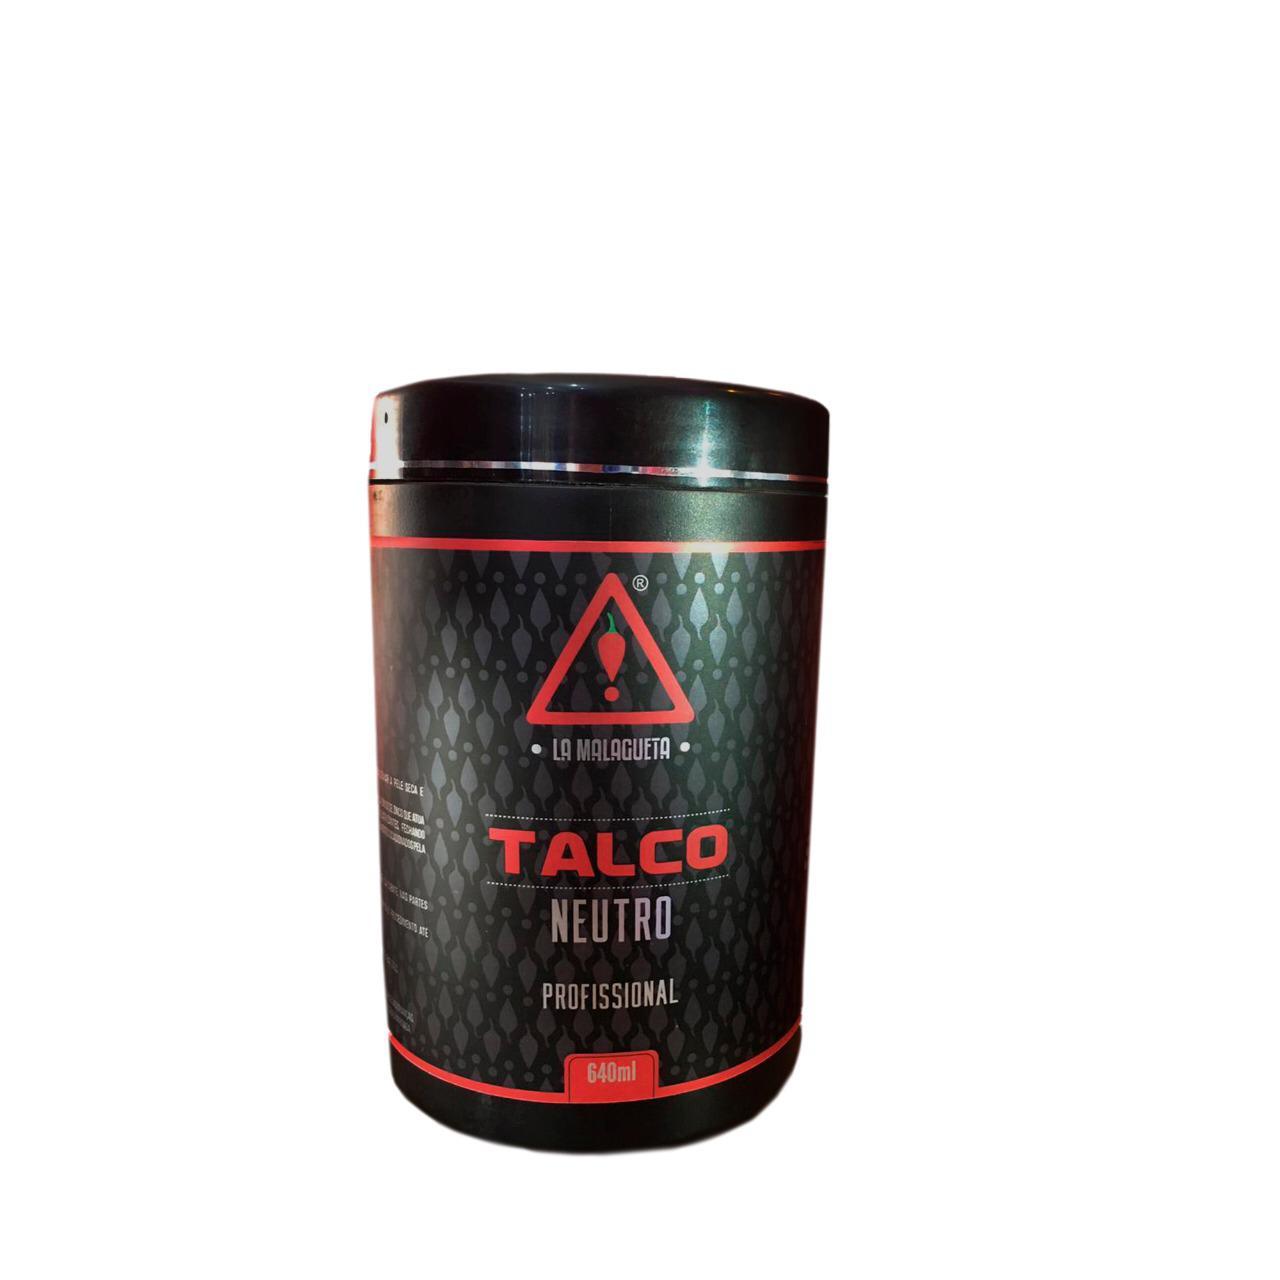 Talco 640g Neutro